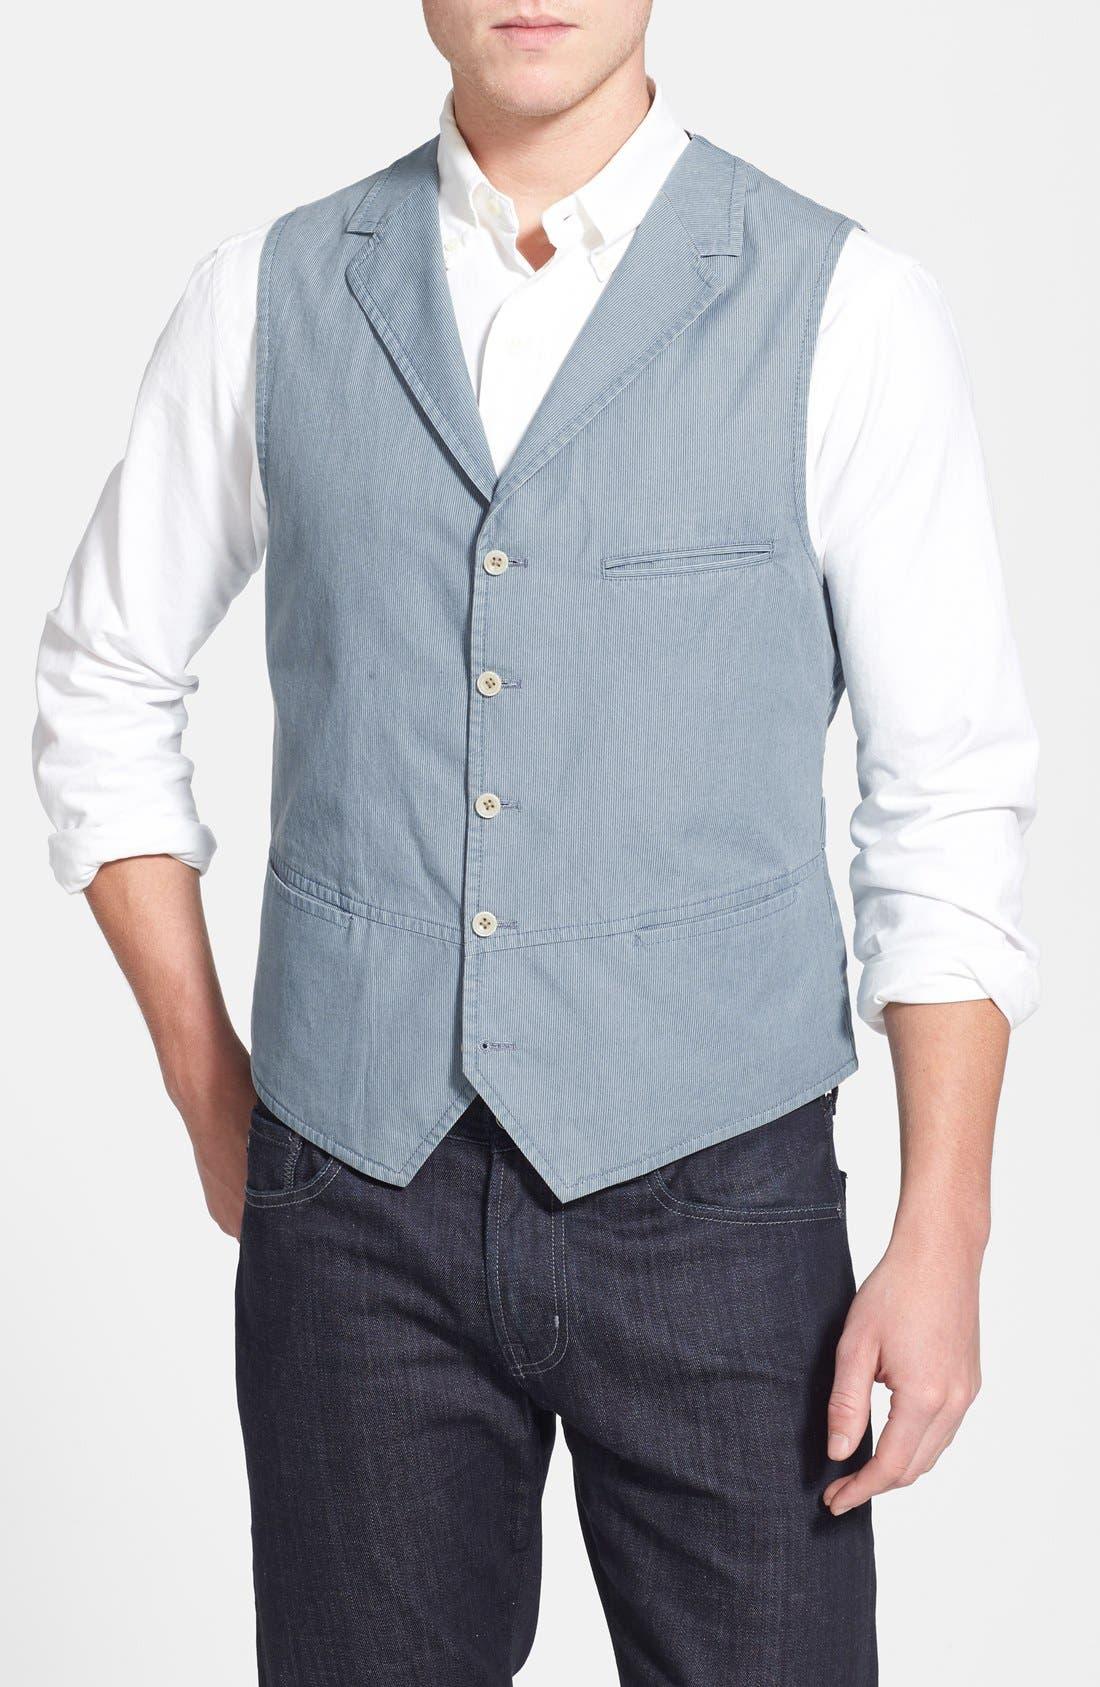 Alternate Image 1 Selected - Kroon 'Axel' Regular Fit Vest